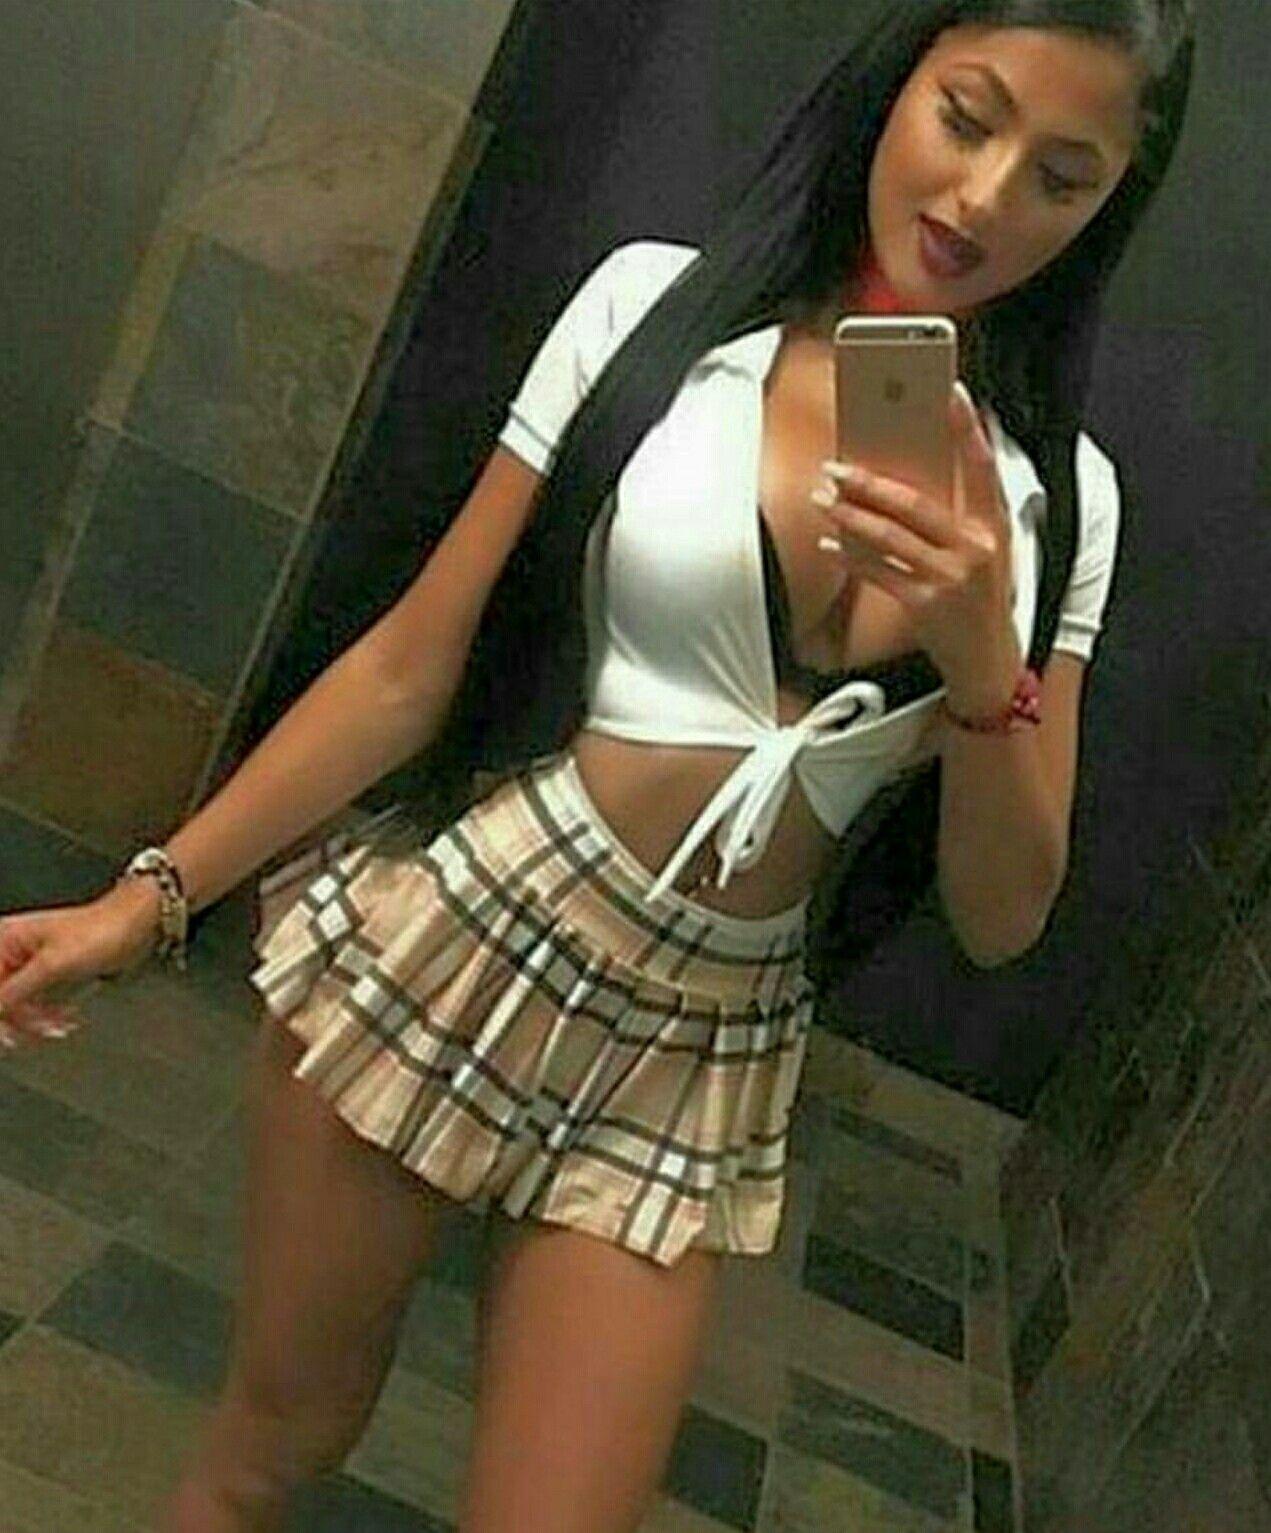 Rascal Pick School Girl Long Black Hair Busty Beauty